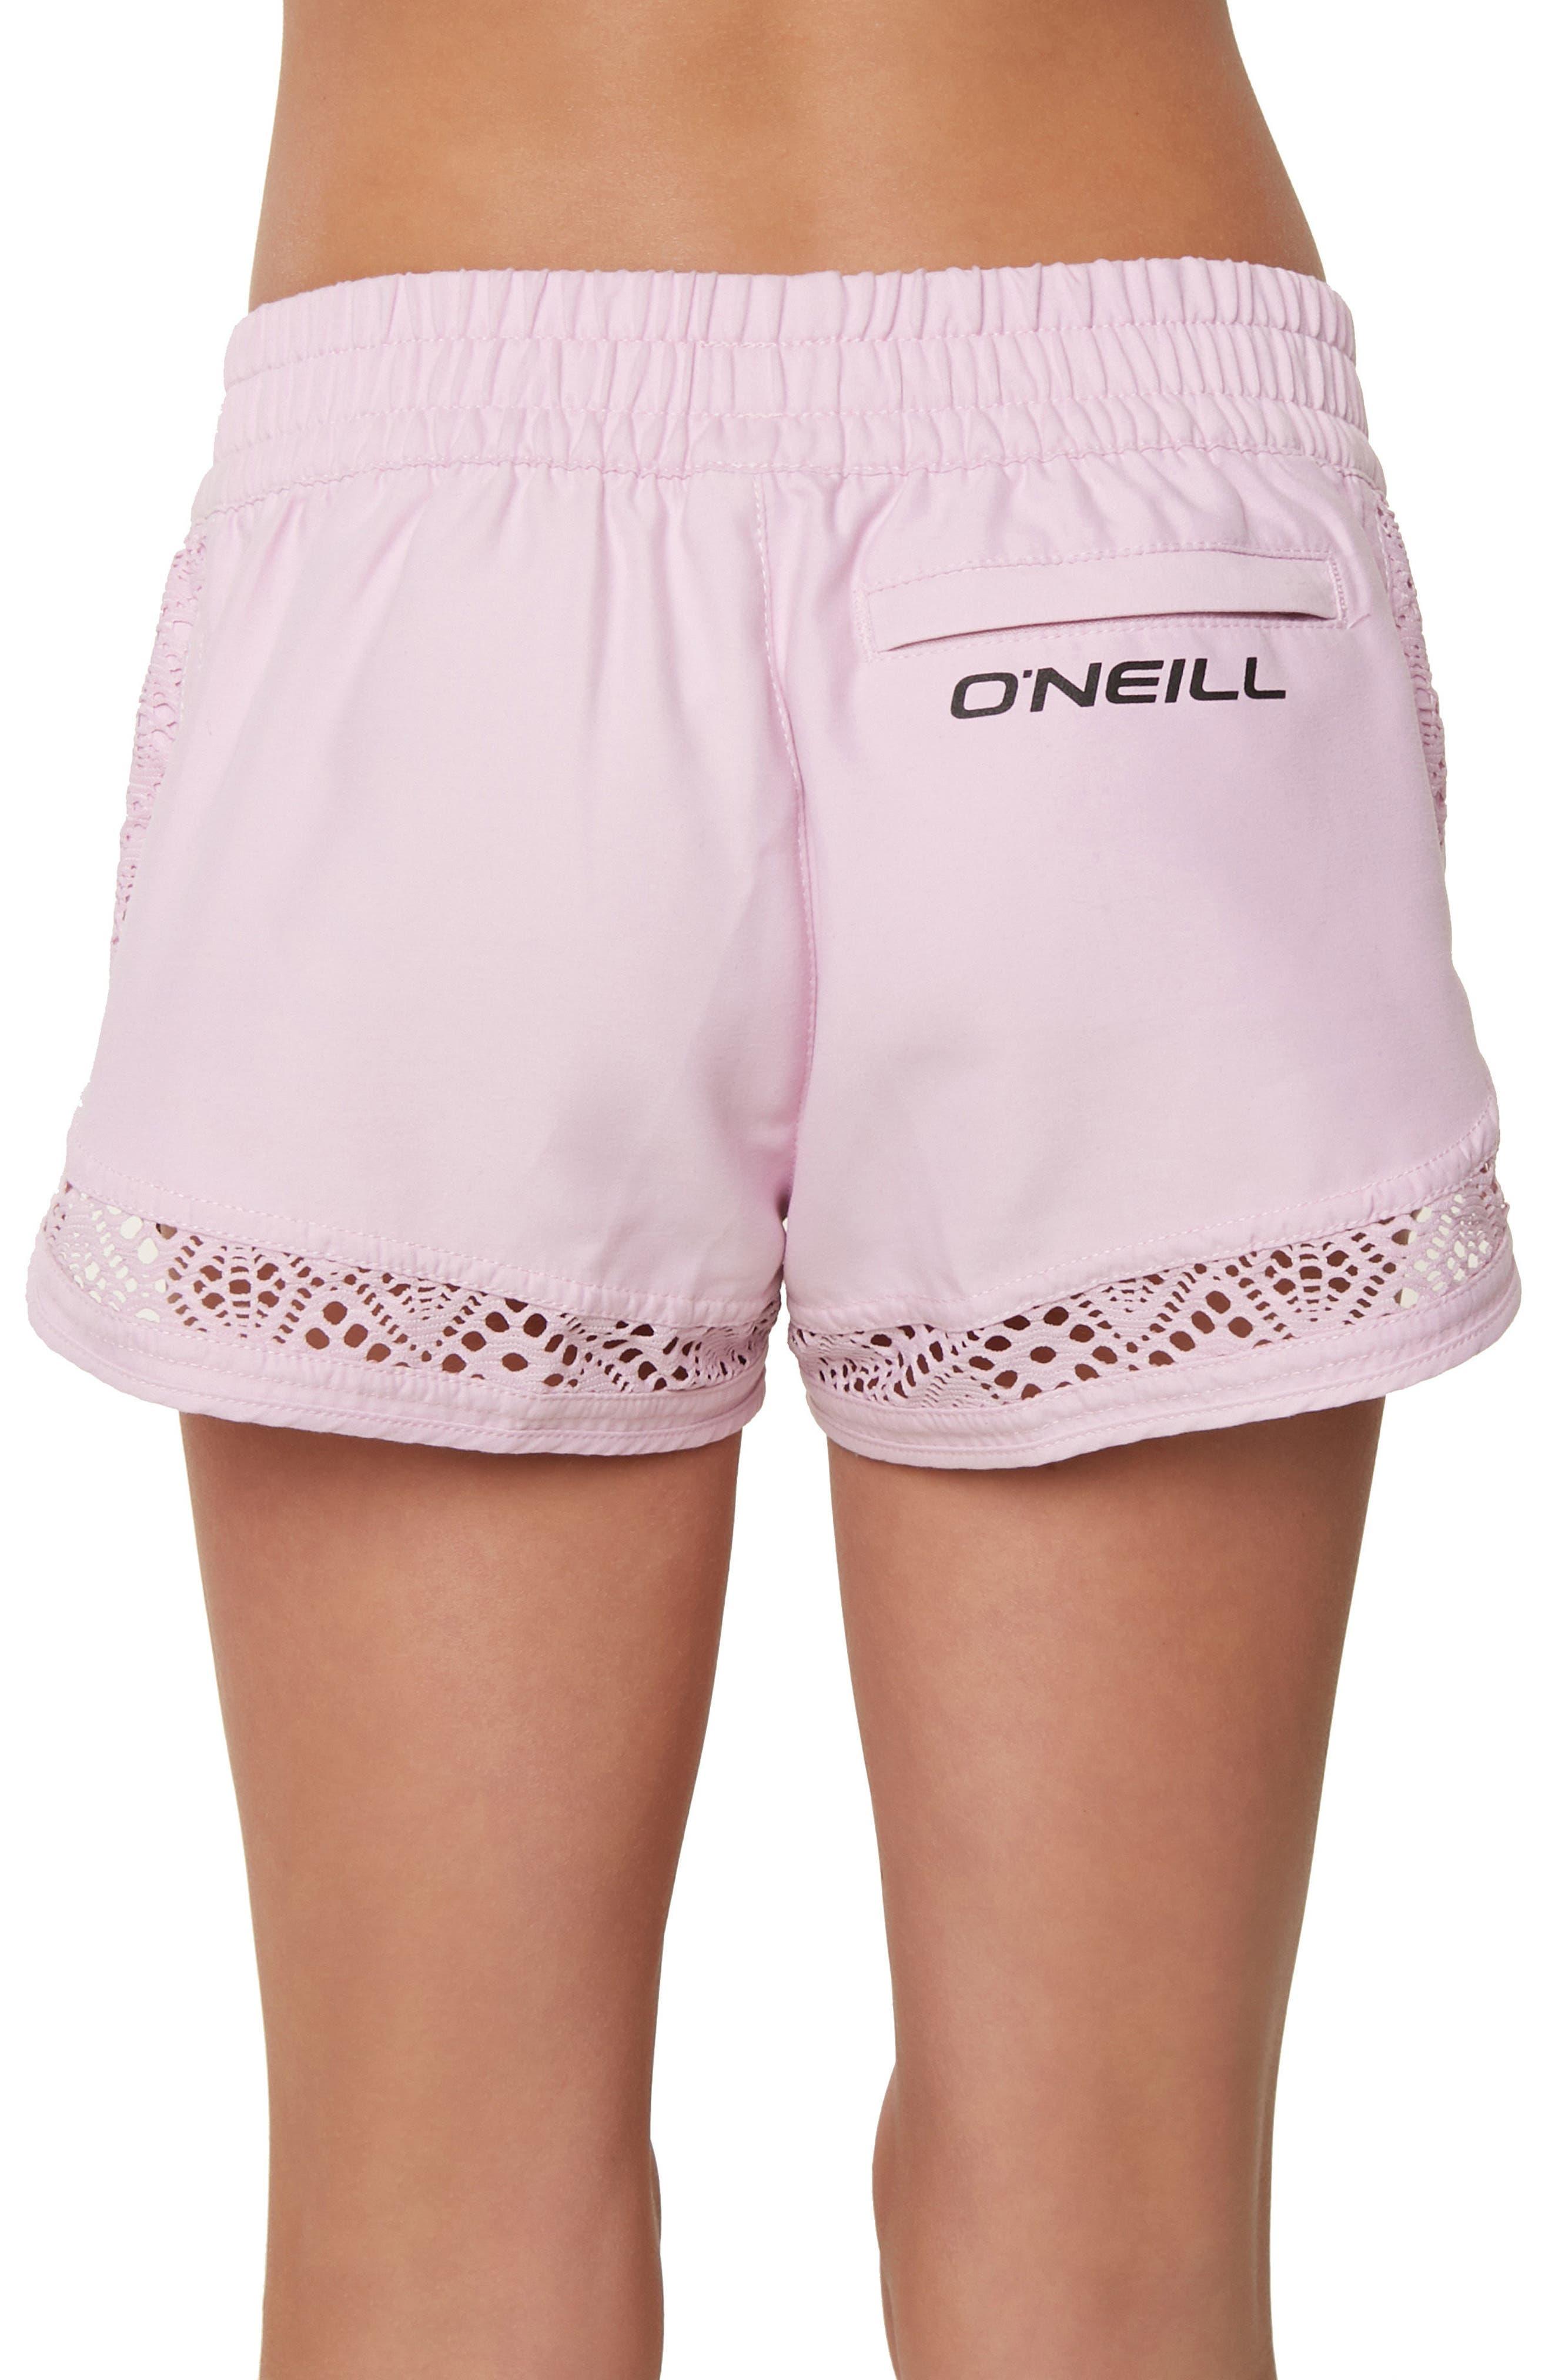 Renewal 2 Board Shorts,                             Alternate thumbnail 4, color,                             Pink Lavender